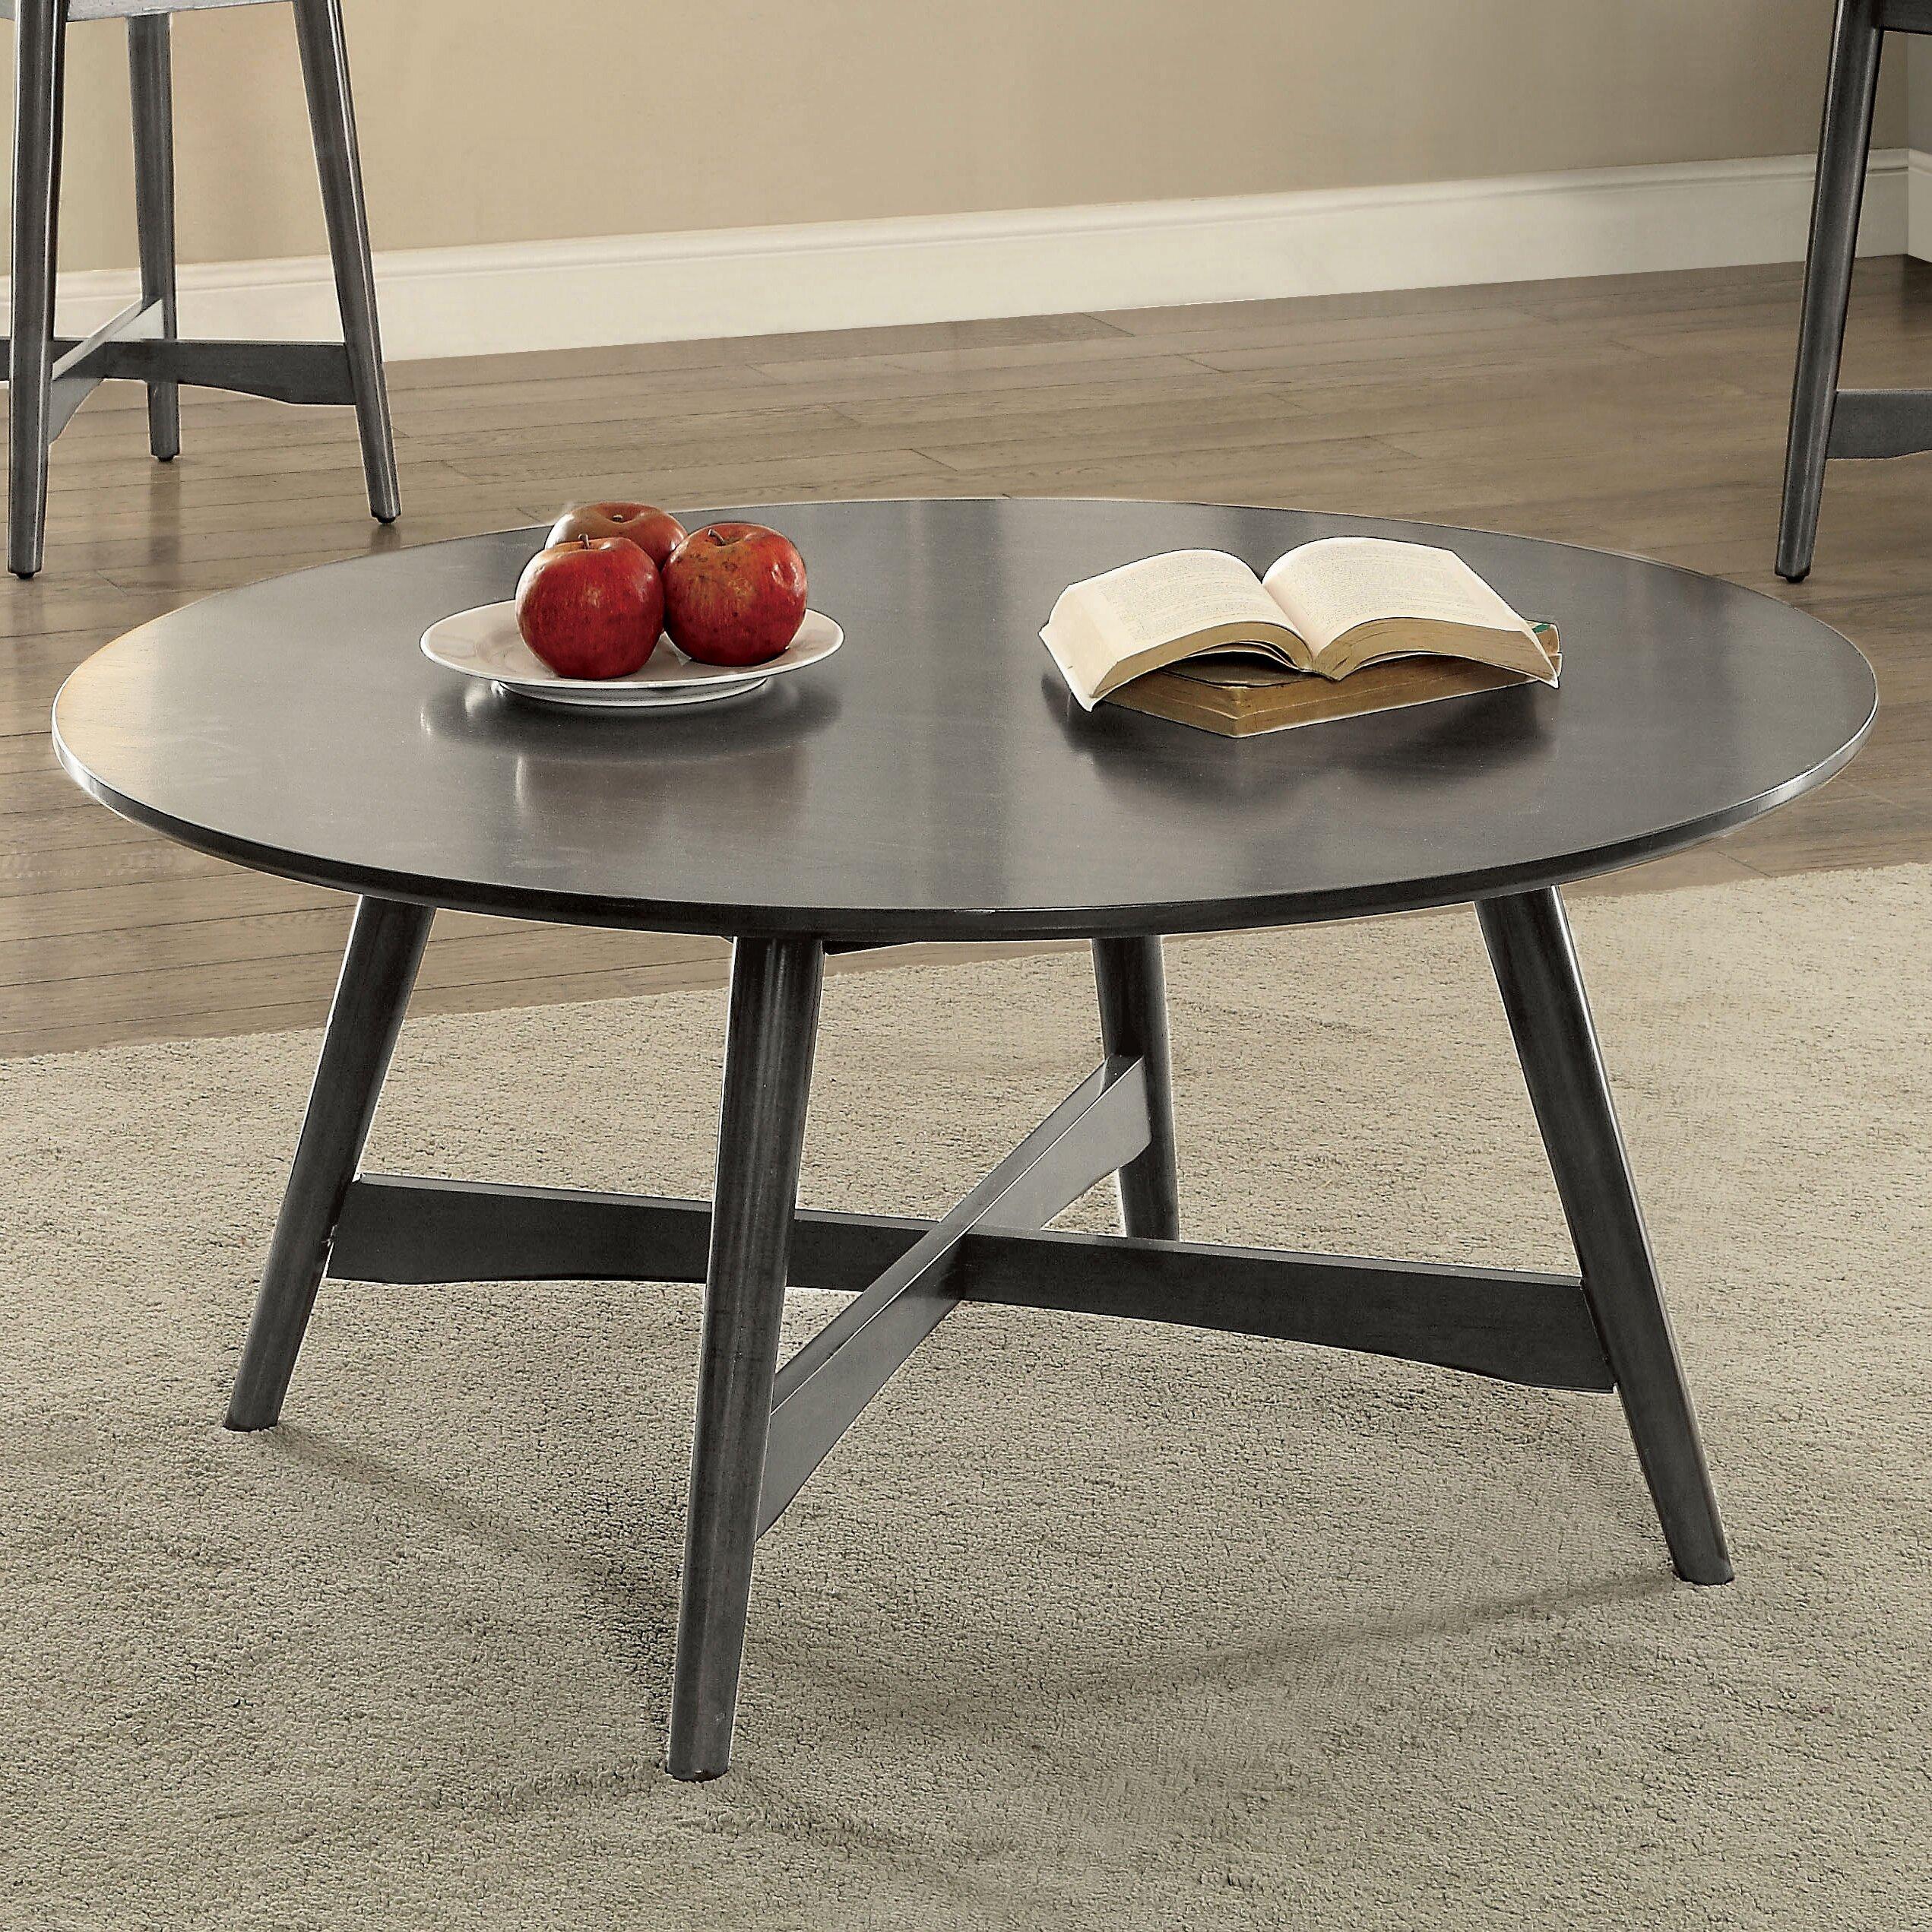 Ivy bronx dogwood mid century modern 2 piece coffee table for Wayfair mid century coffee table